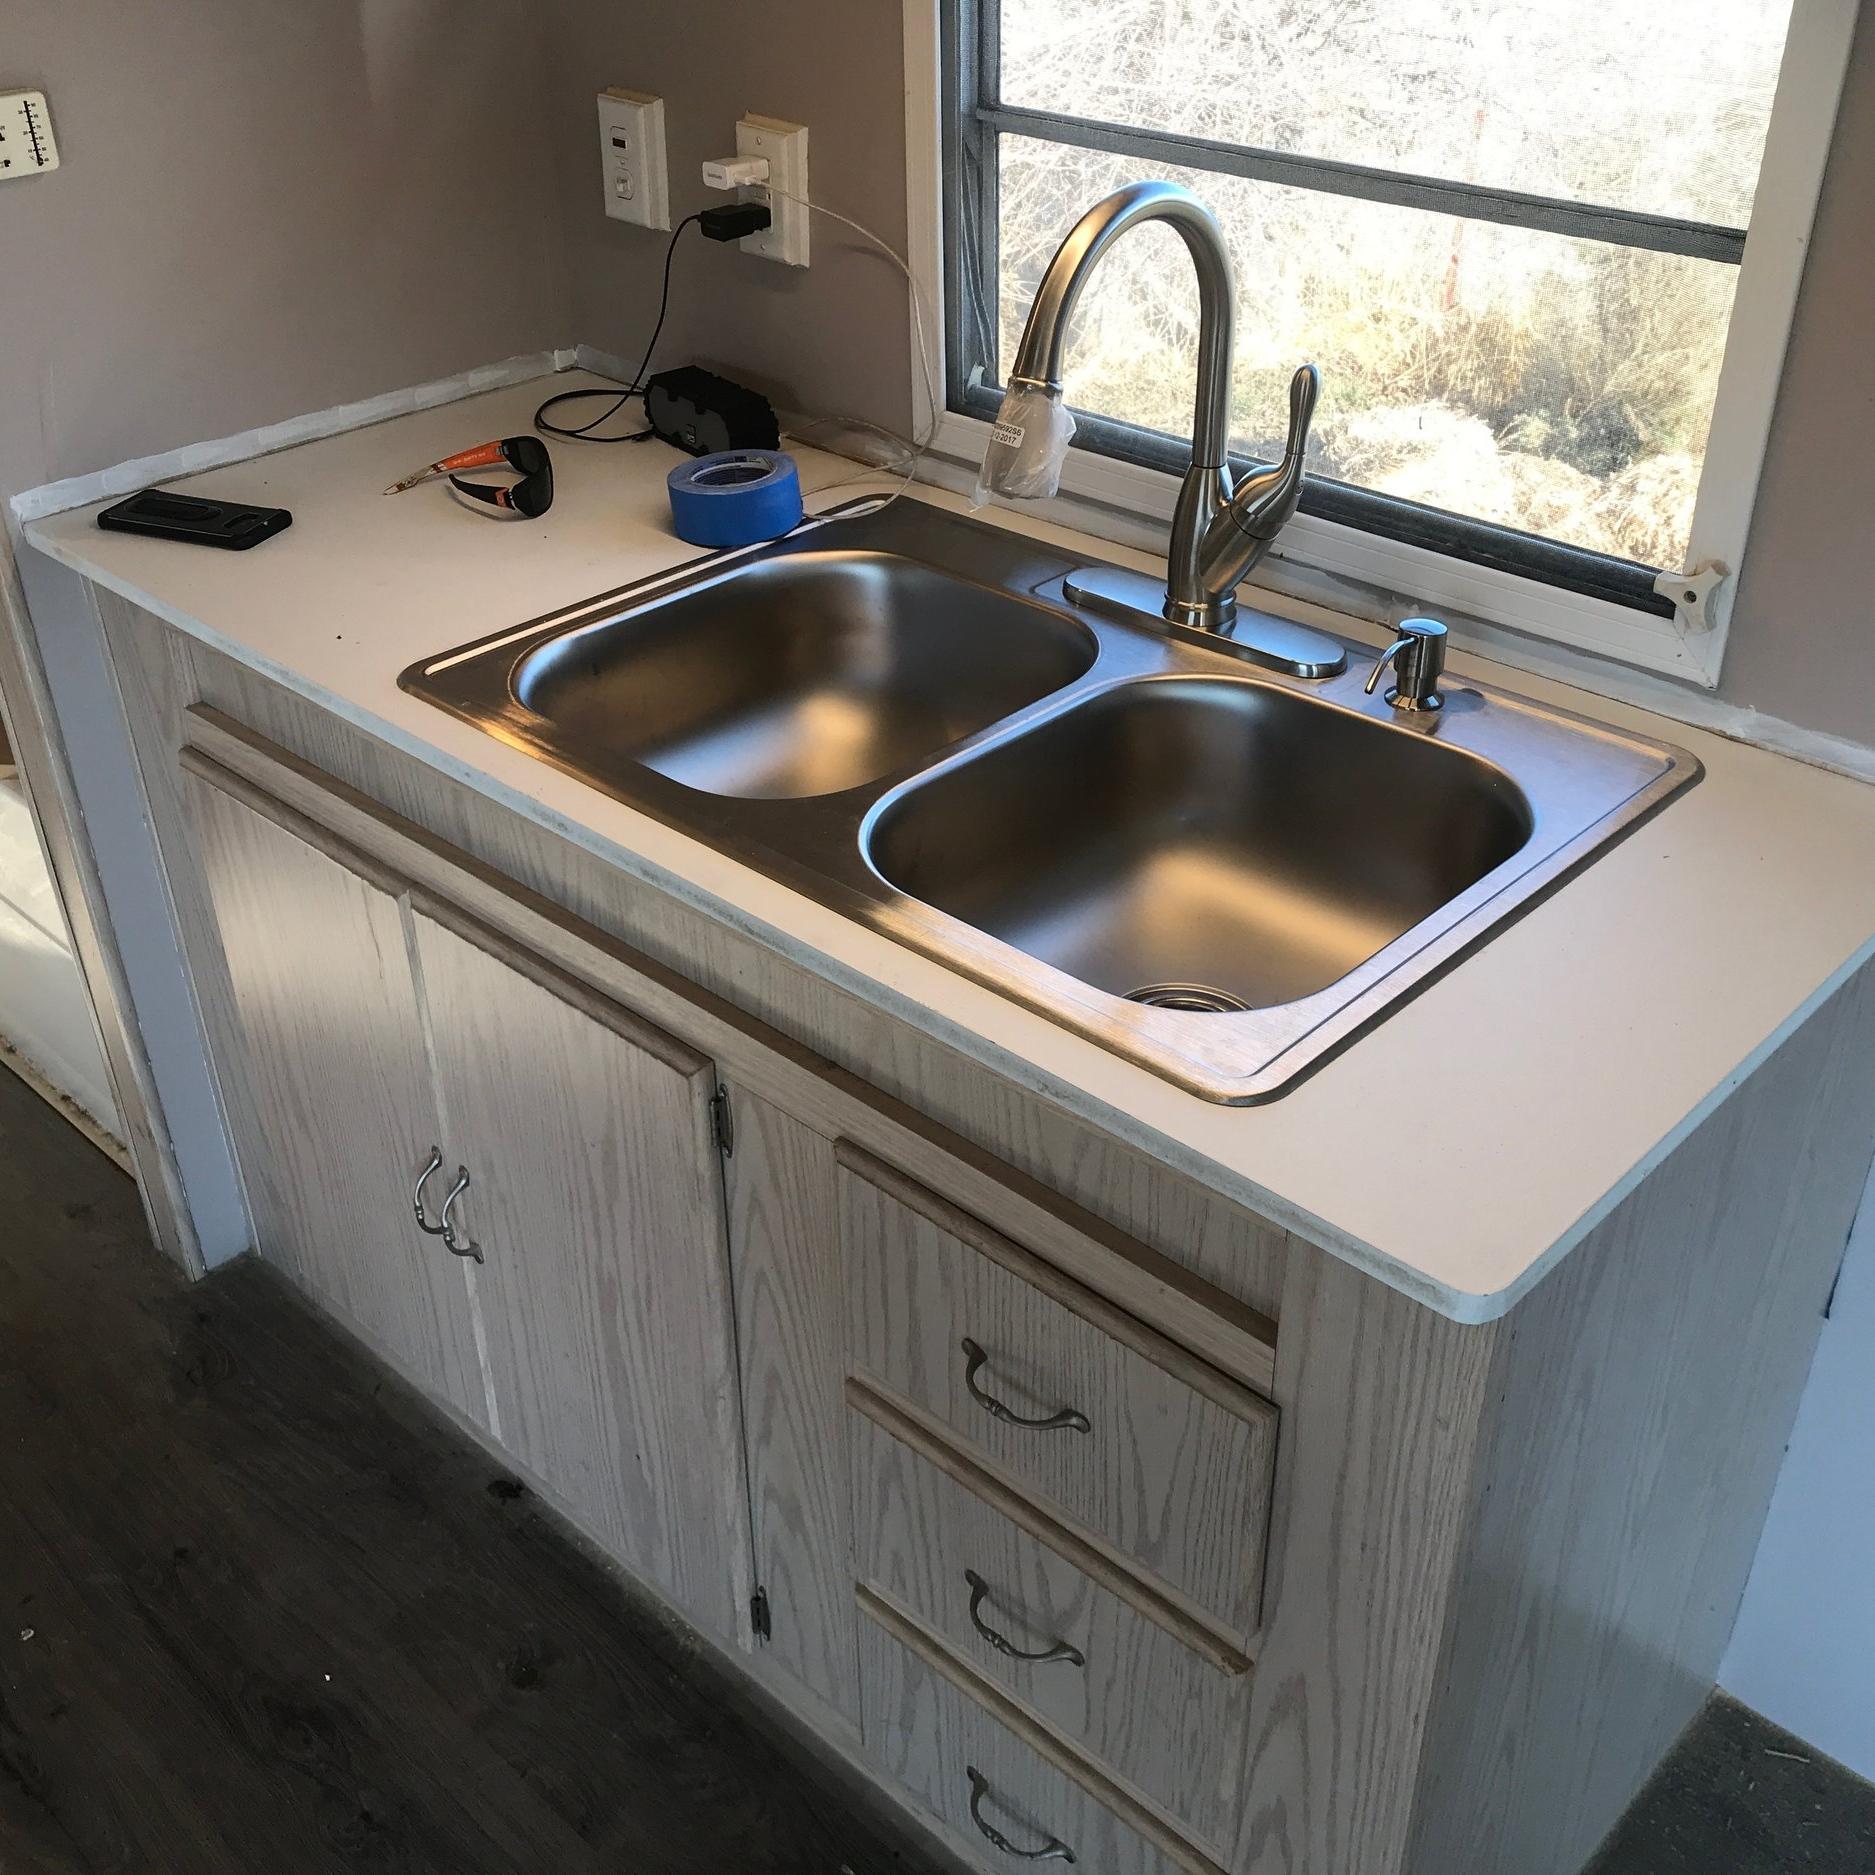 RV Sink and cabinet installation -